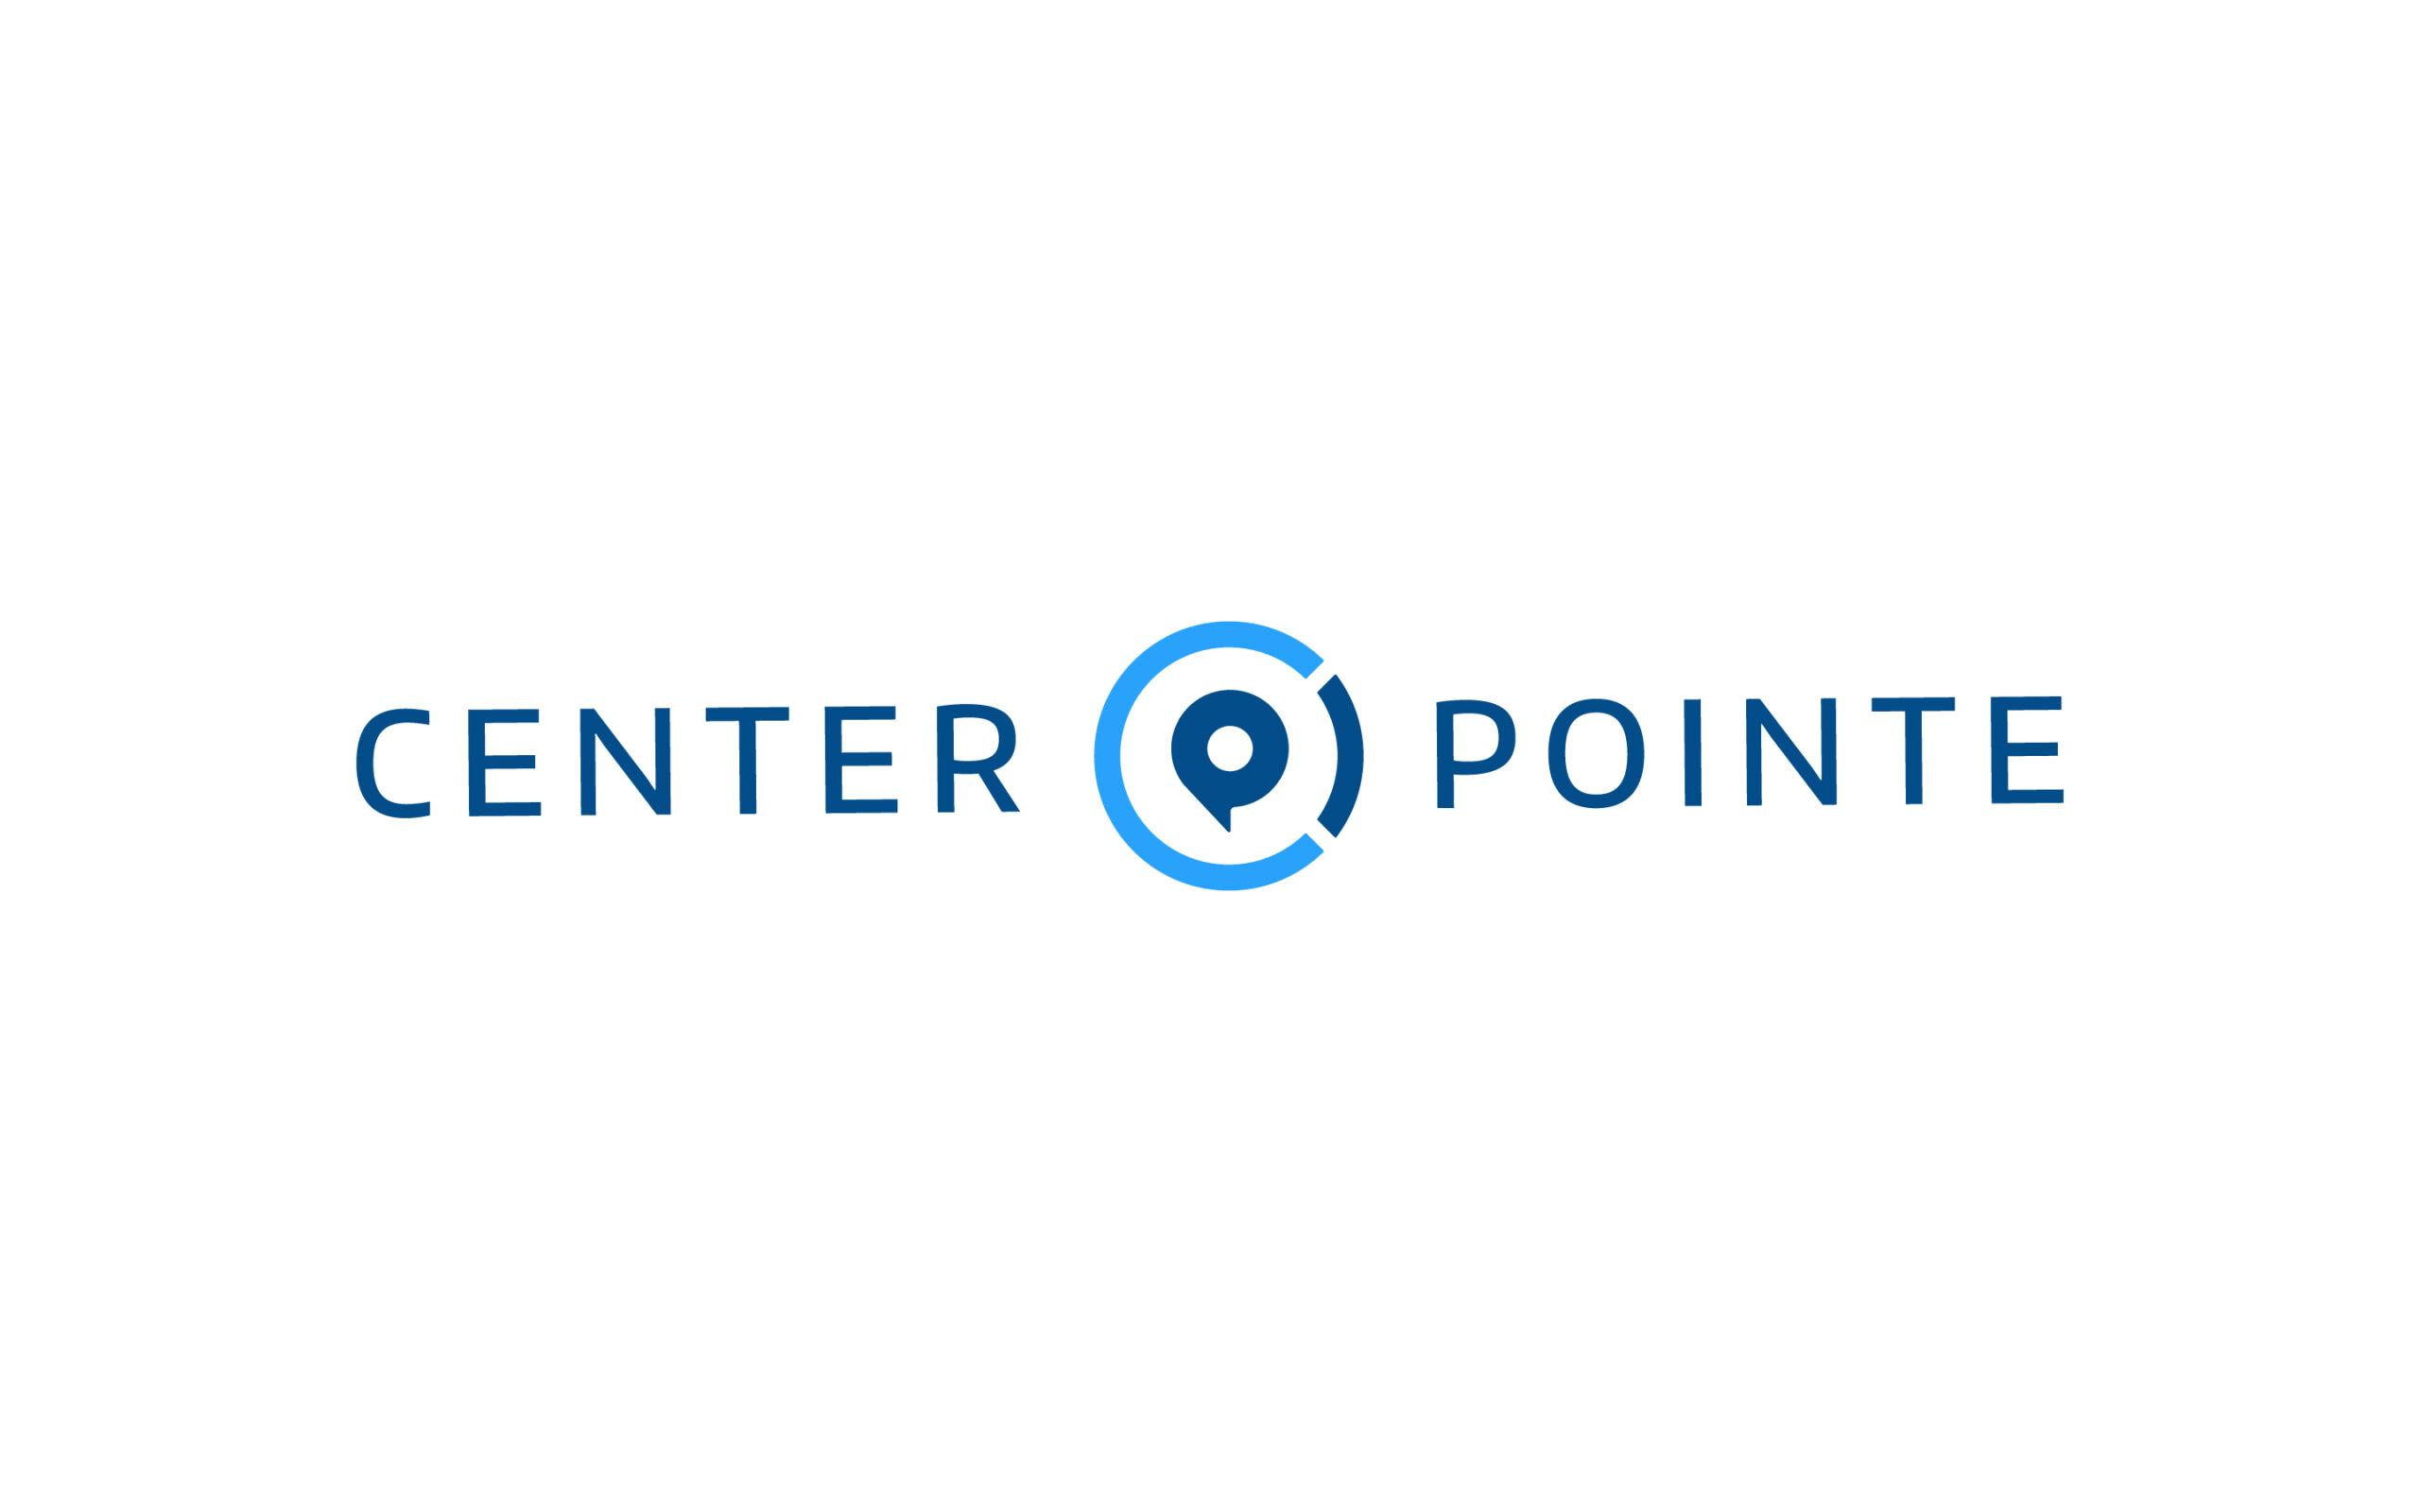 centerpointe logo